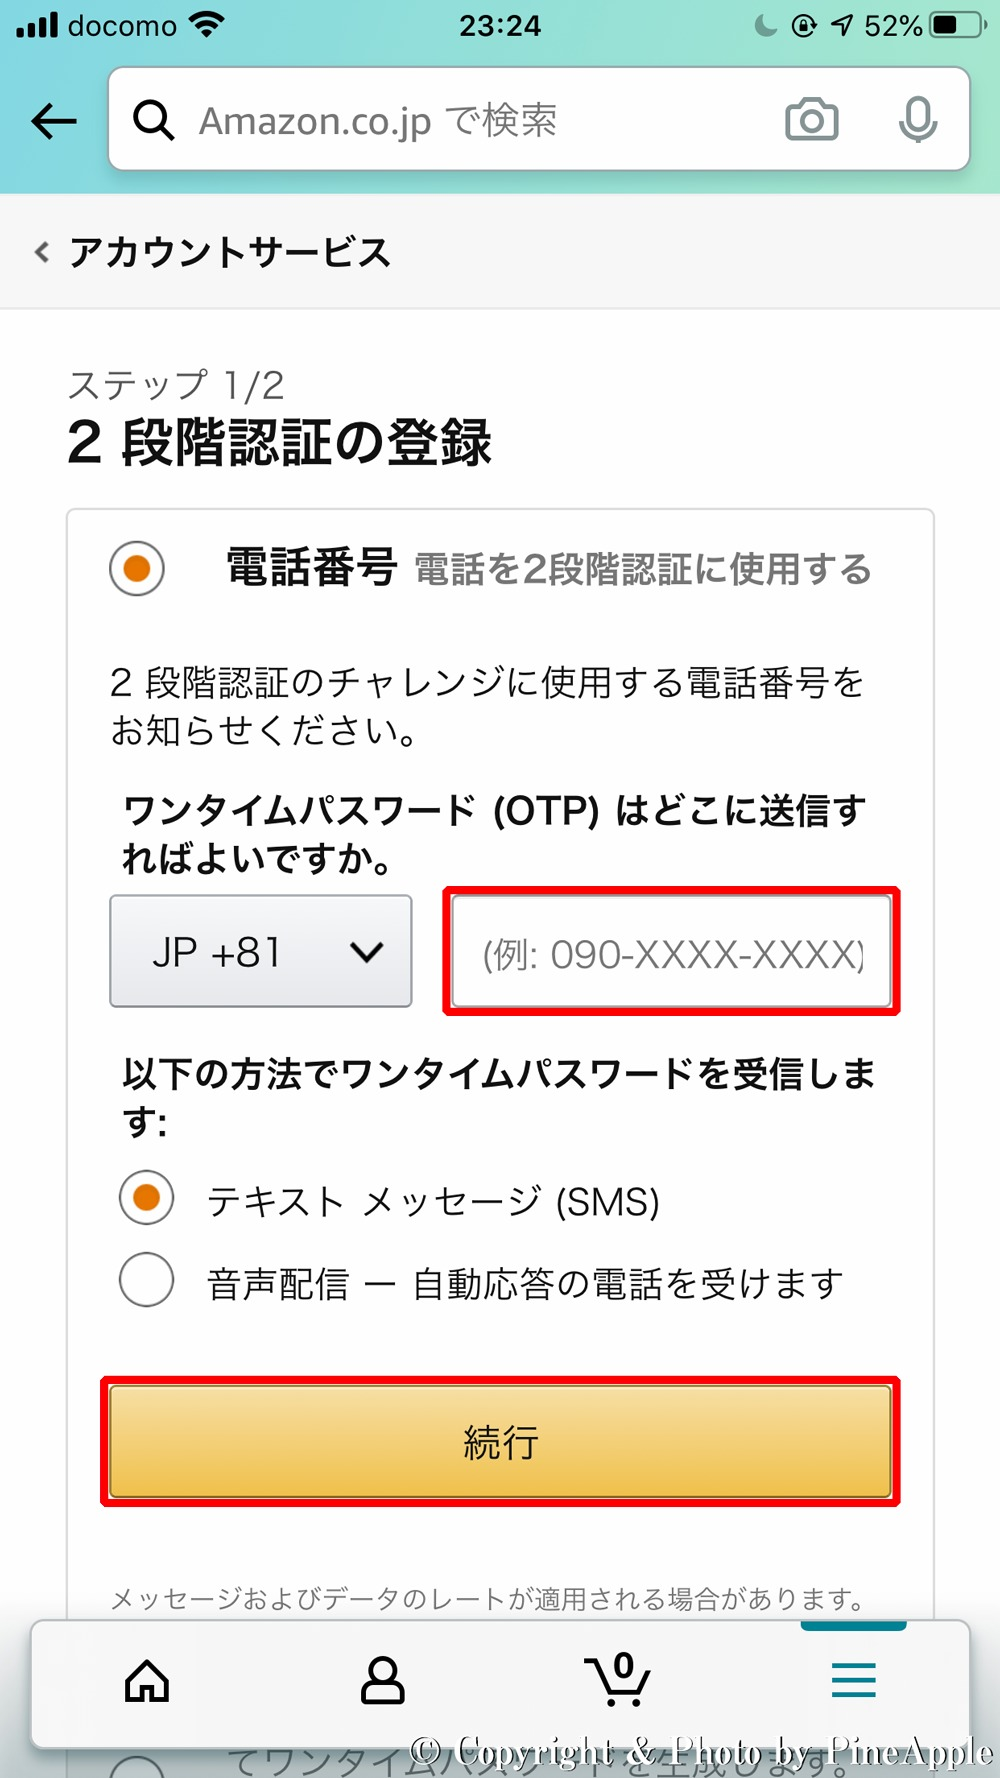 Amazon アカウントの 2 段階認証設定:「電話番号」入力欄に送信先の「電話番号」を入力し、「続行」をタップ